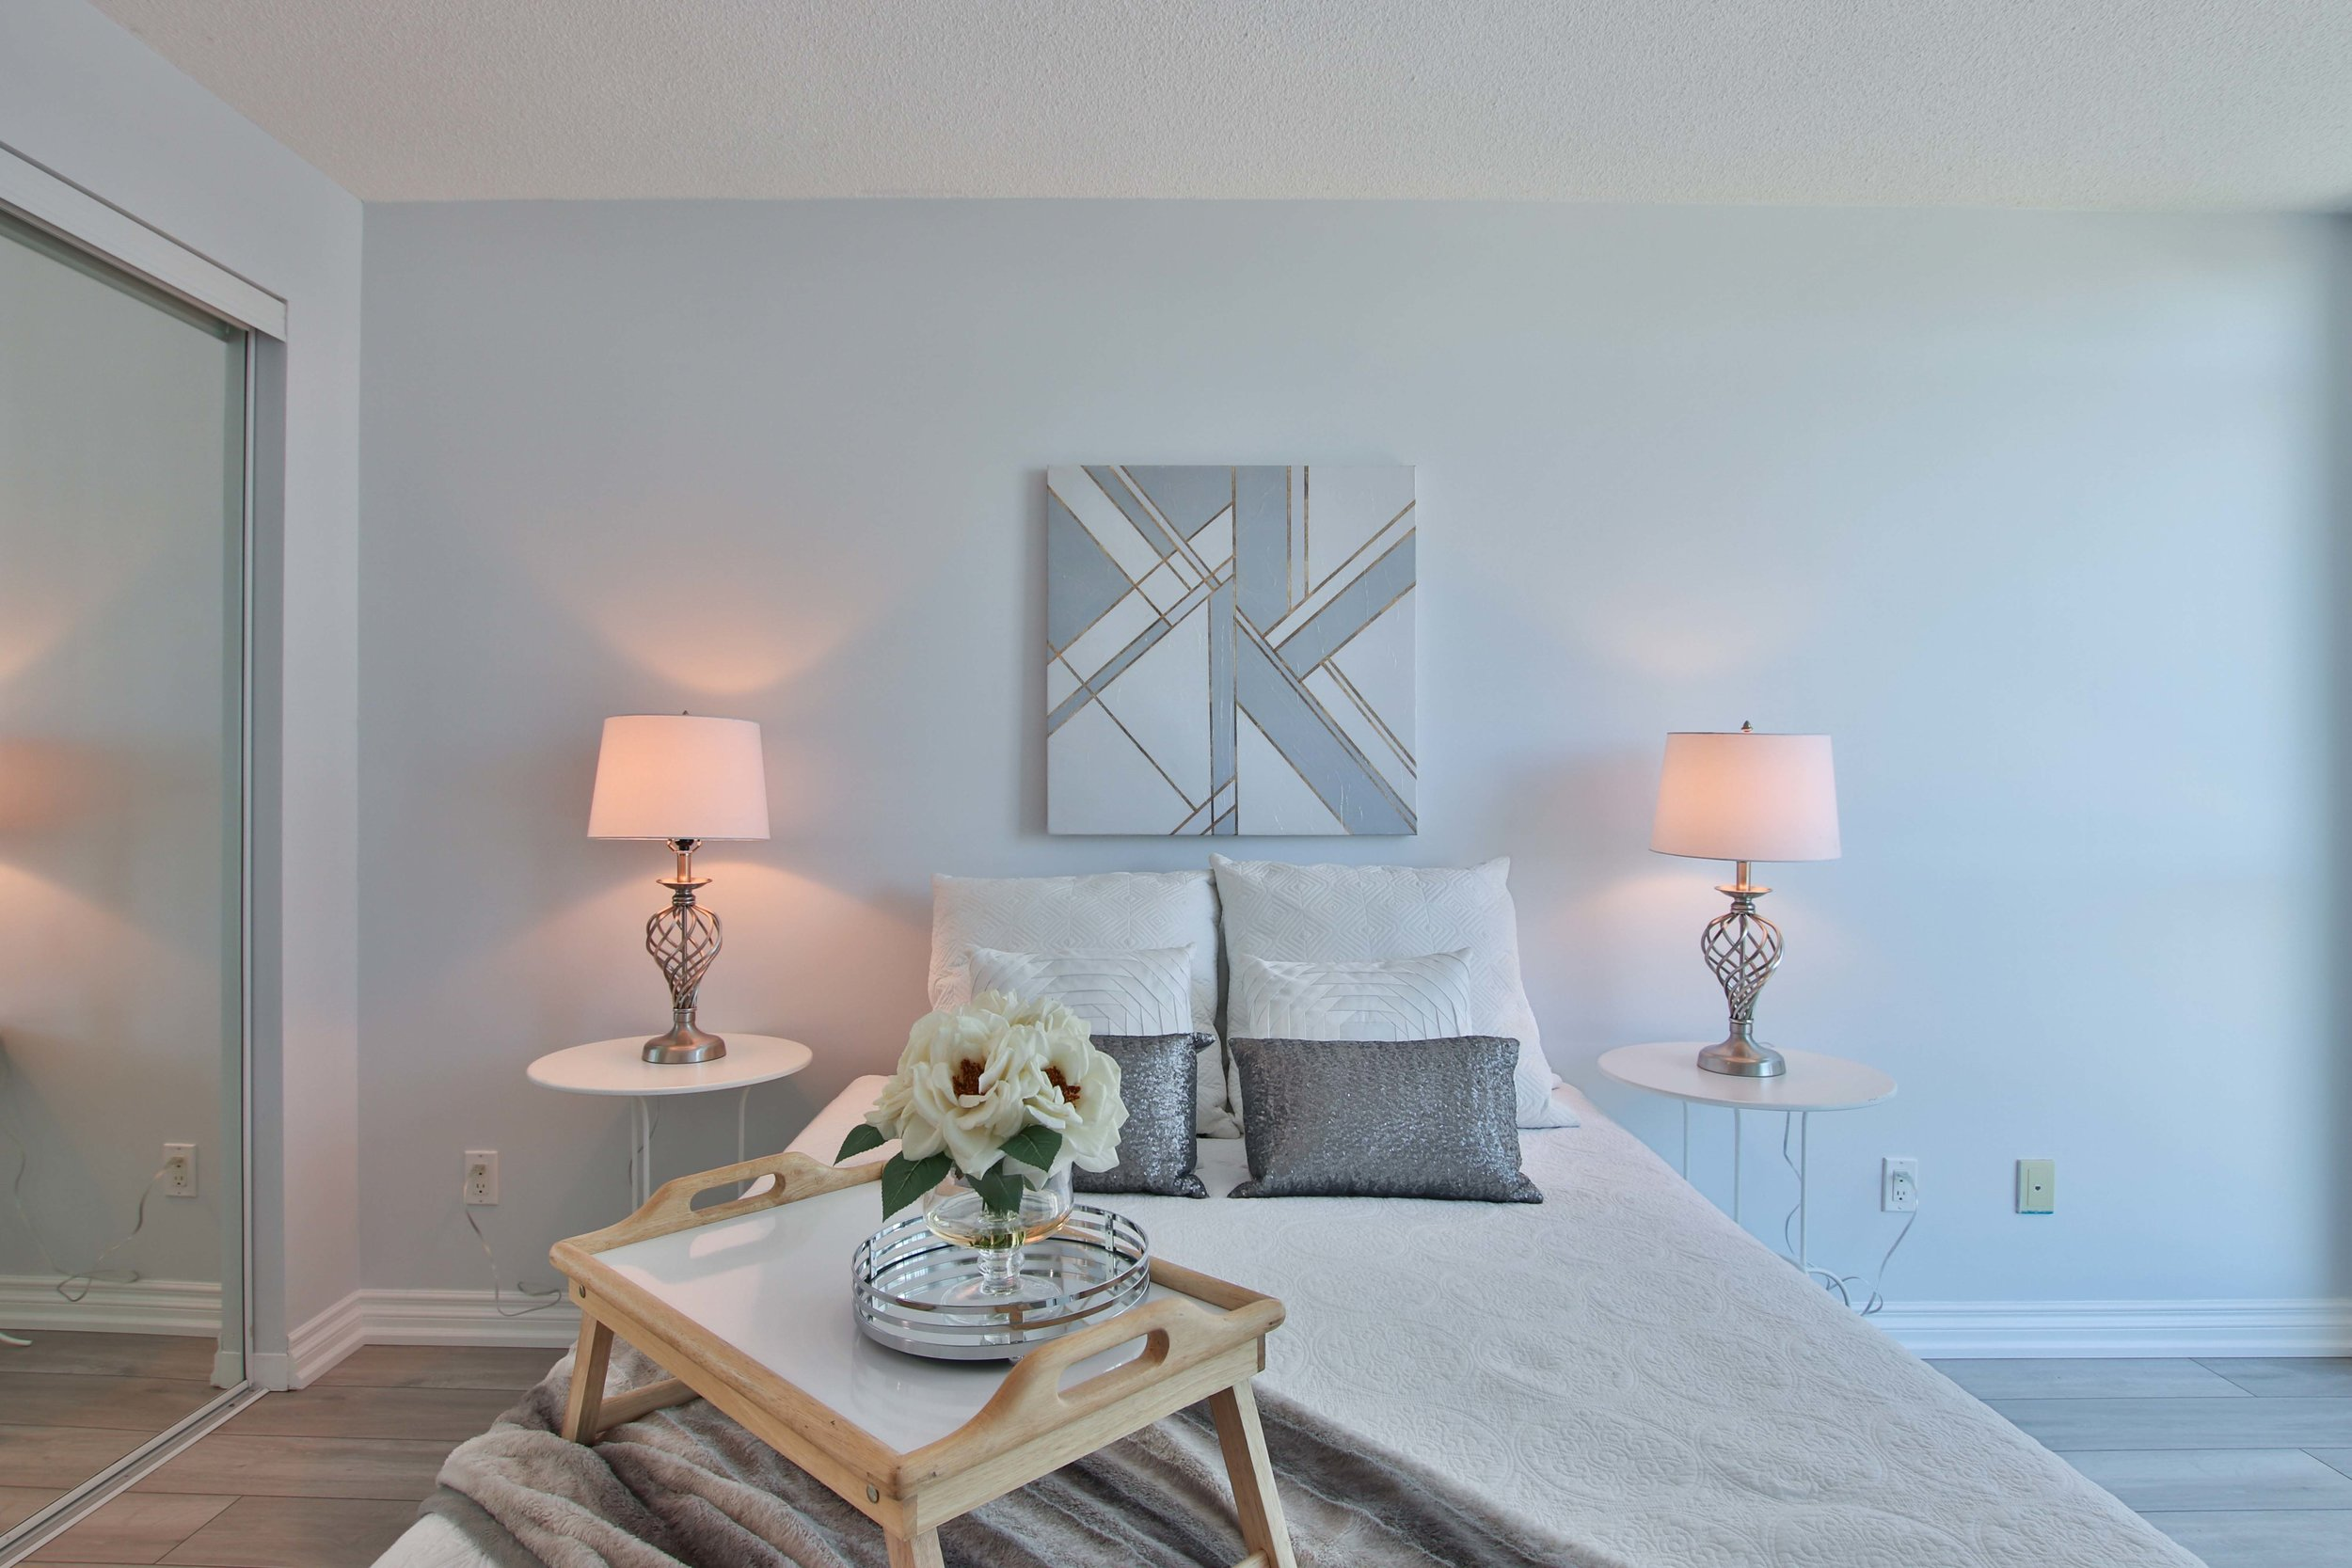 29_Bedroom.jpg